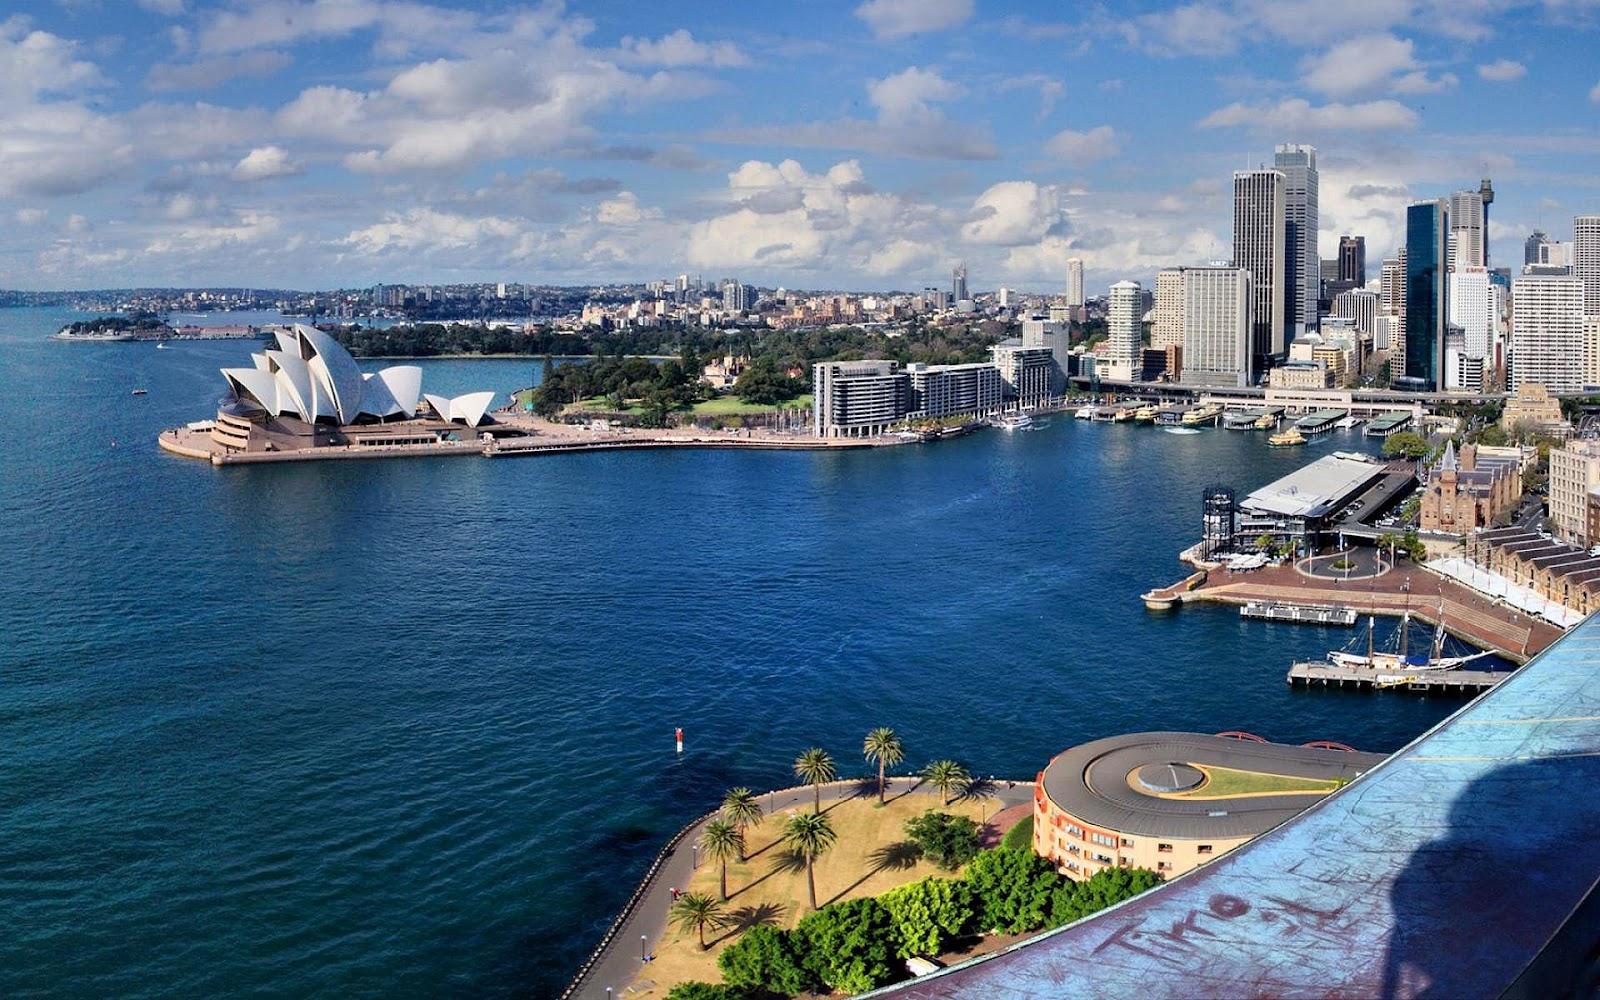 Stad Sydney wallpaper HD steden Sydney Australi foto 1600x1000